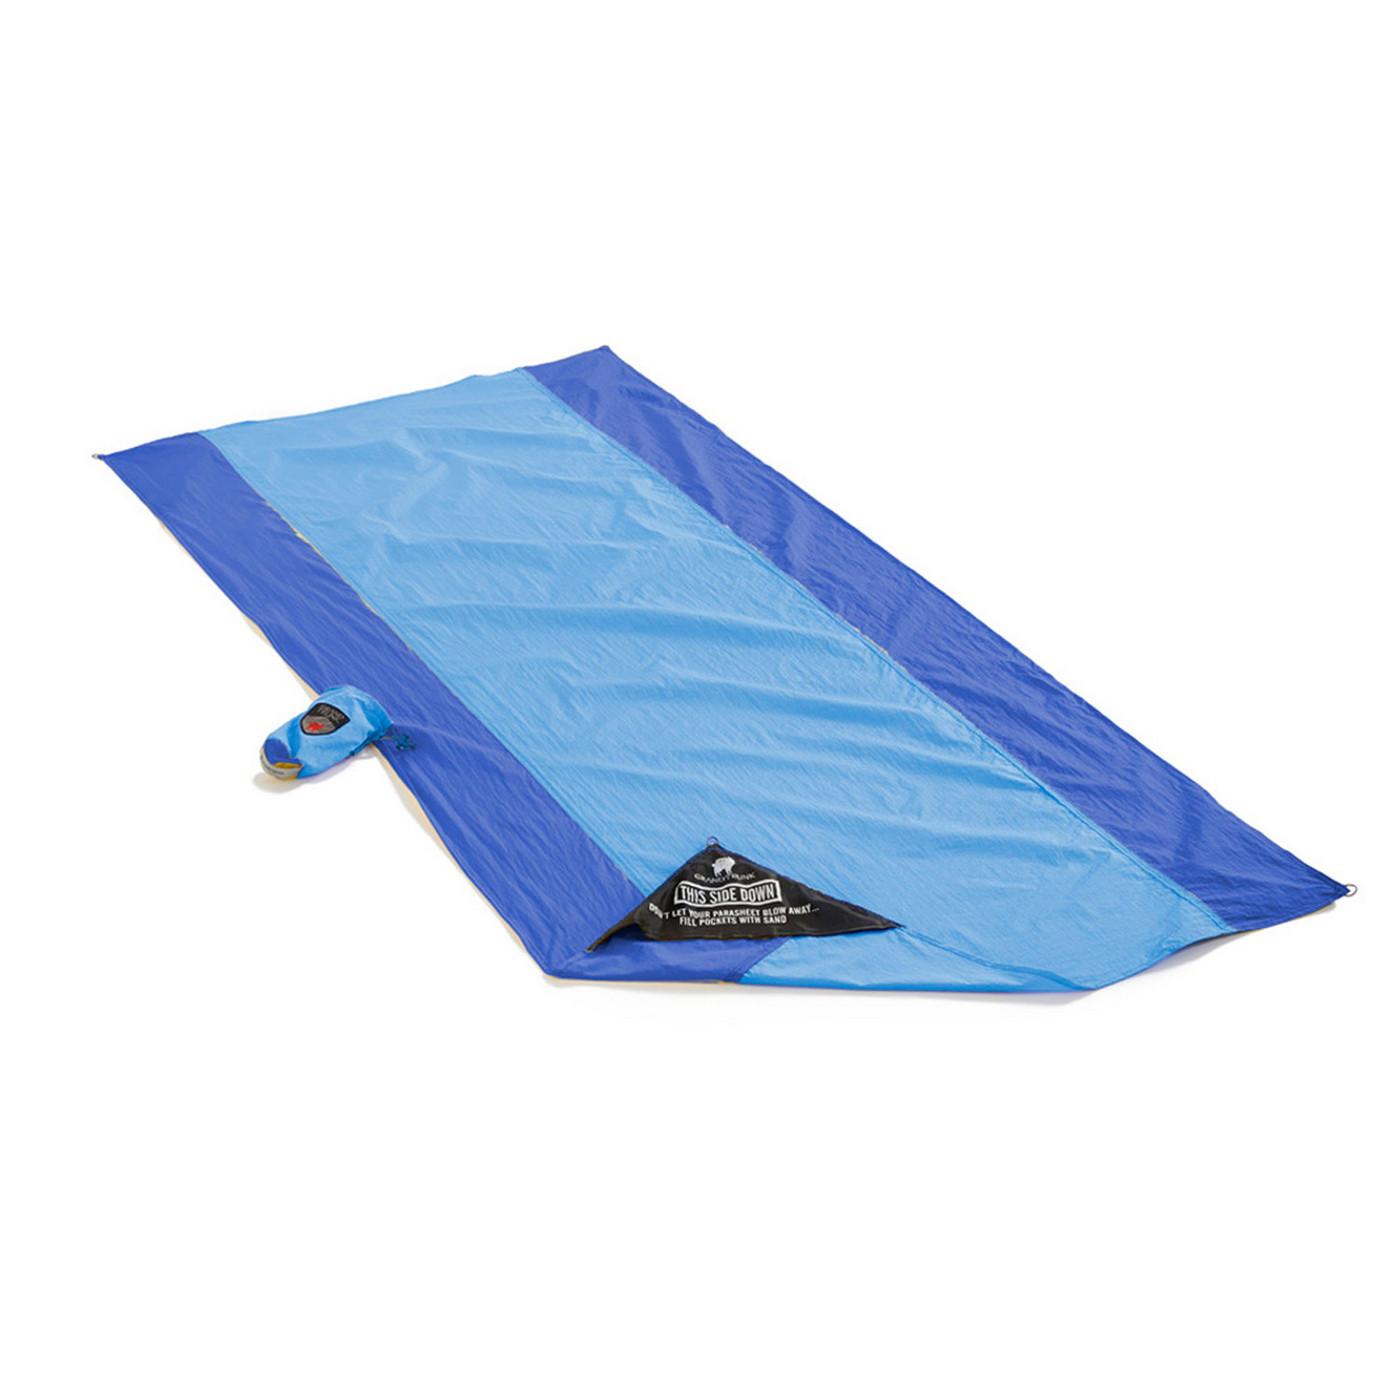 Beach Blanket No Sand: Grand Trunk Double Parasheet Beach Blanket